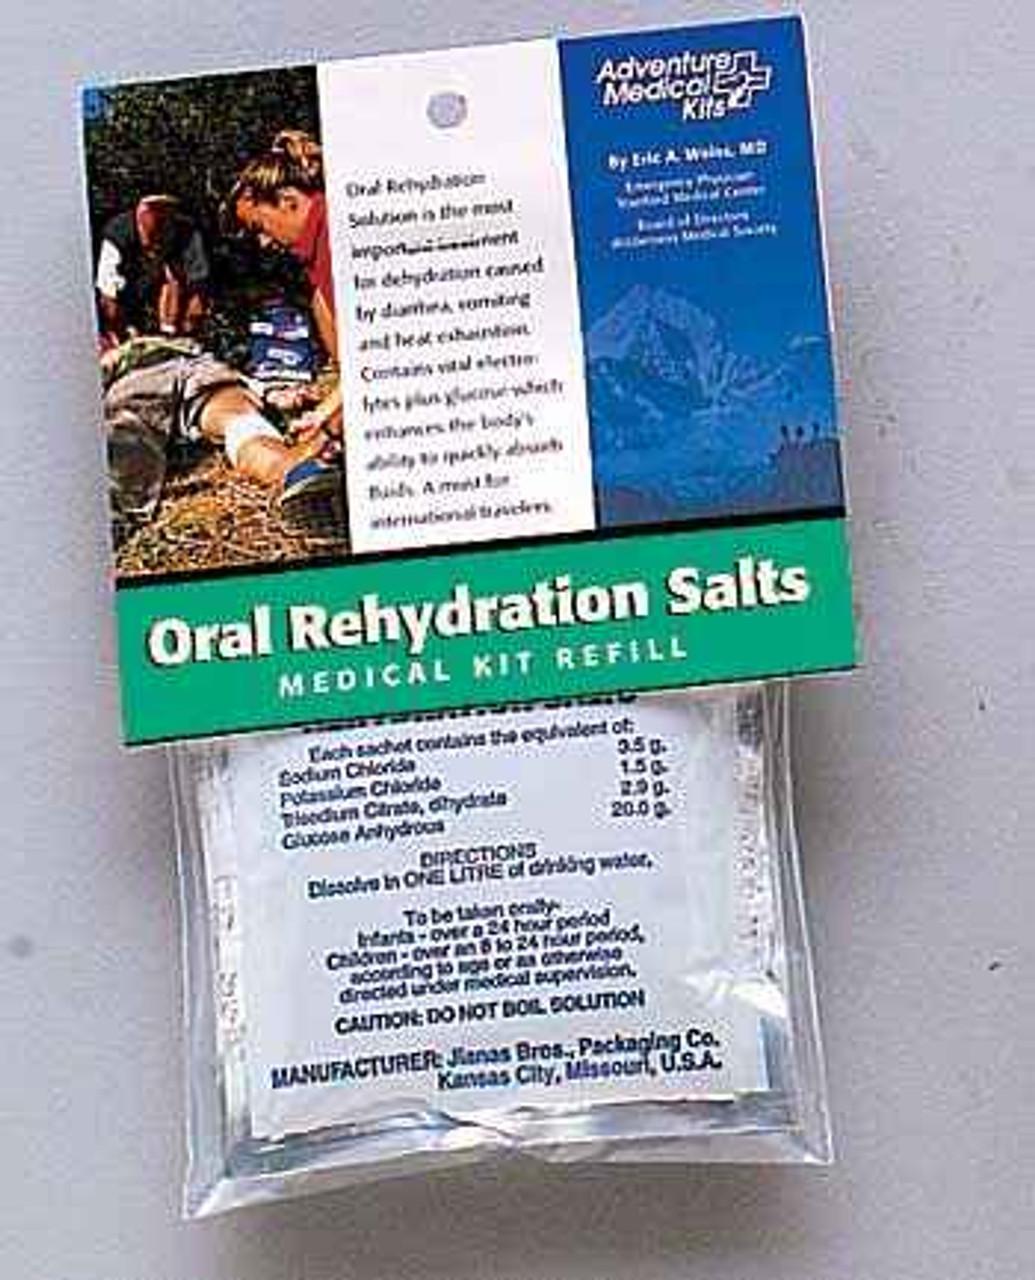 Adventure AD0155-0650 Medical Kits Oral Rehydration Salts 3 Packs